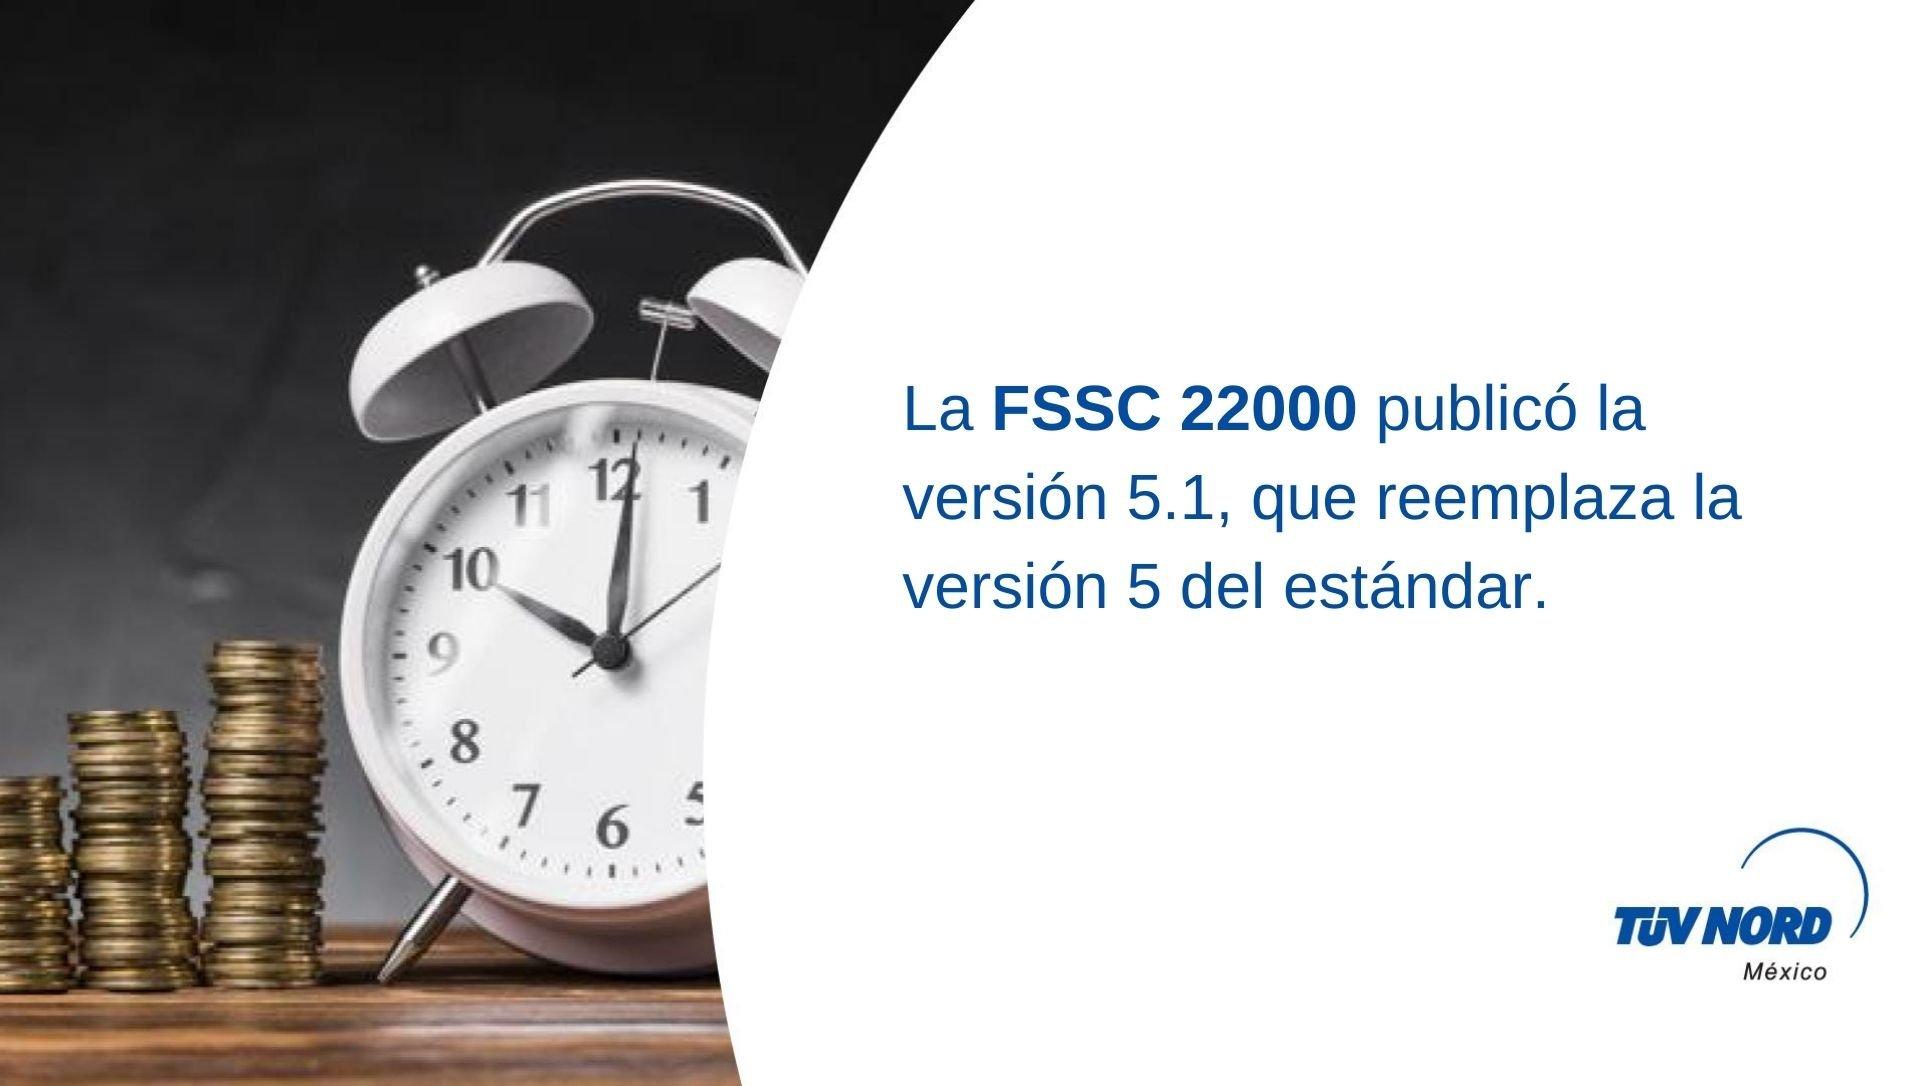 FSSC 22000 Versión 5 – Cambio importante.